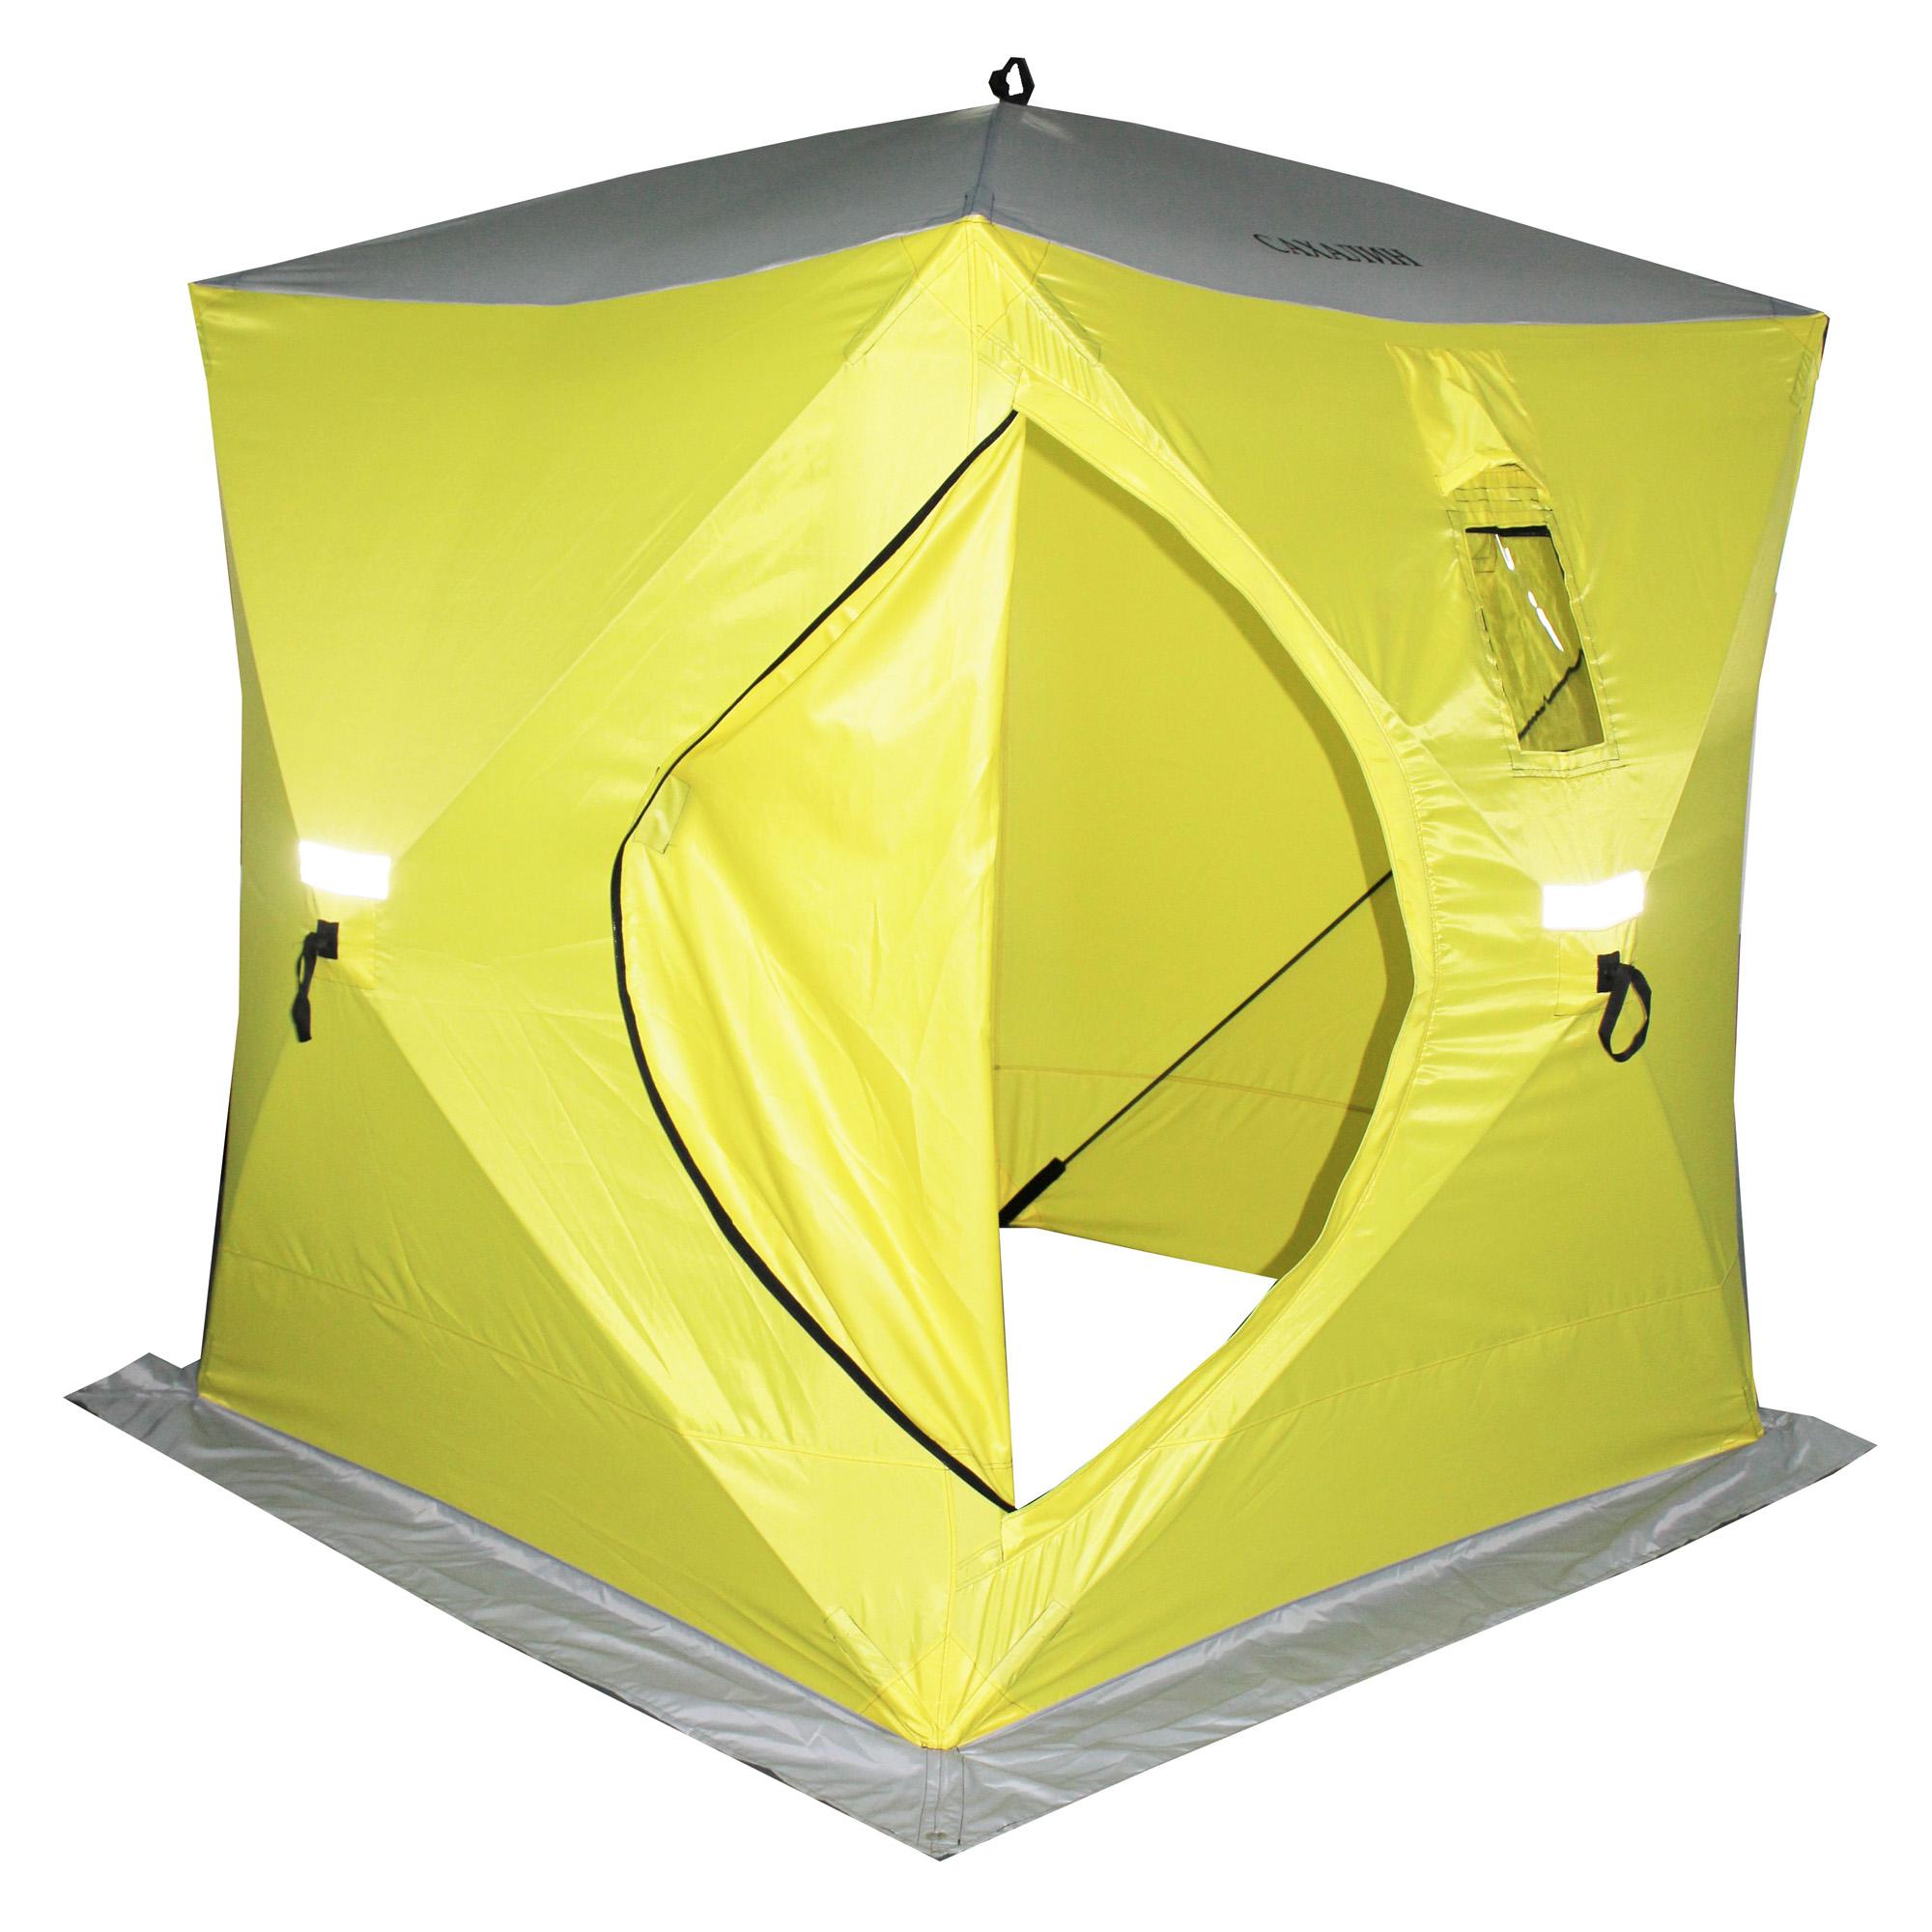 Палатка зимняя Woodland  Сахалин 2 , 150 x 150 x 170 см., Палатки - арт. 1151150162